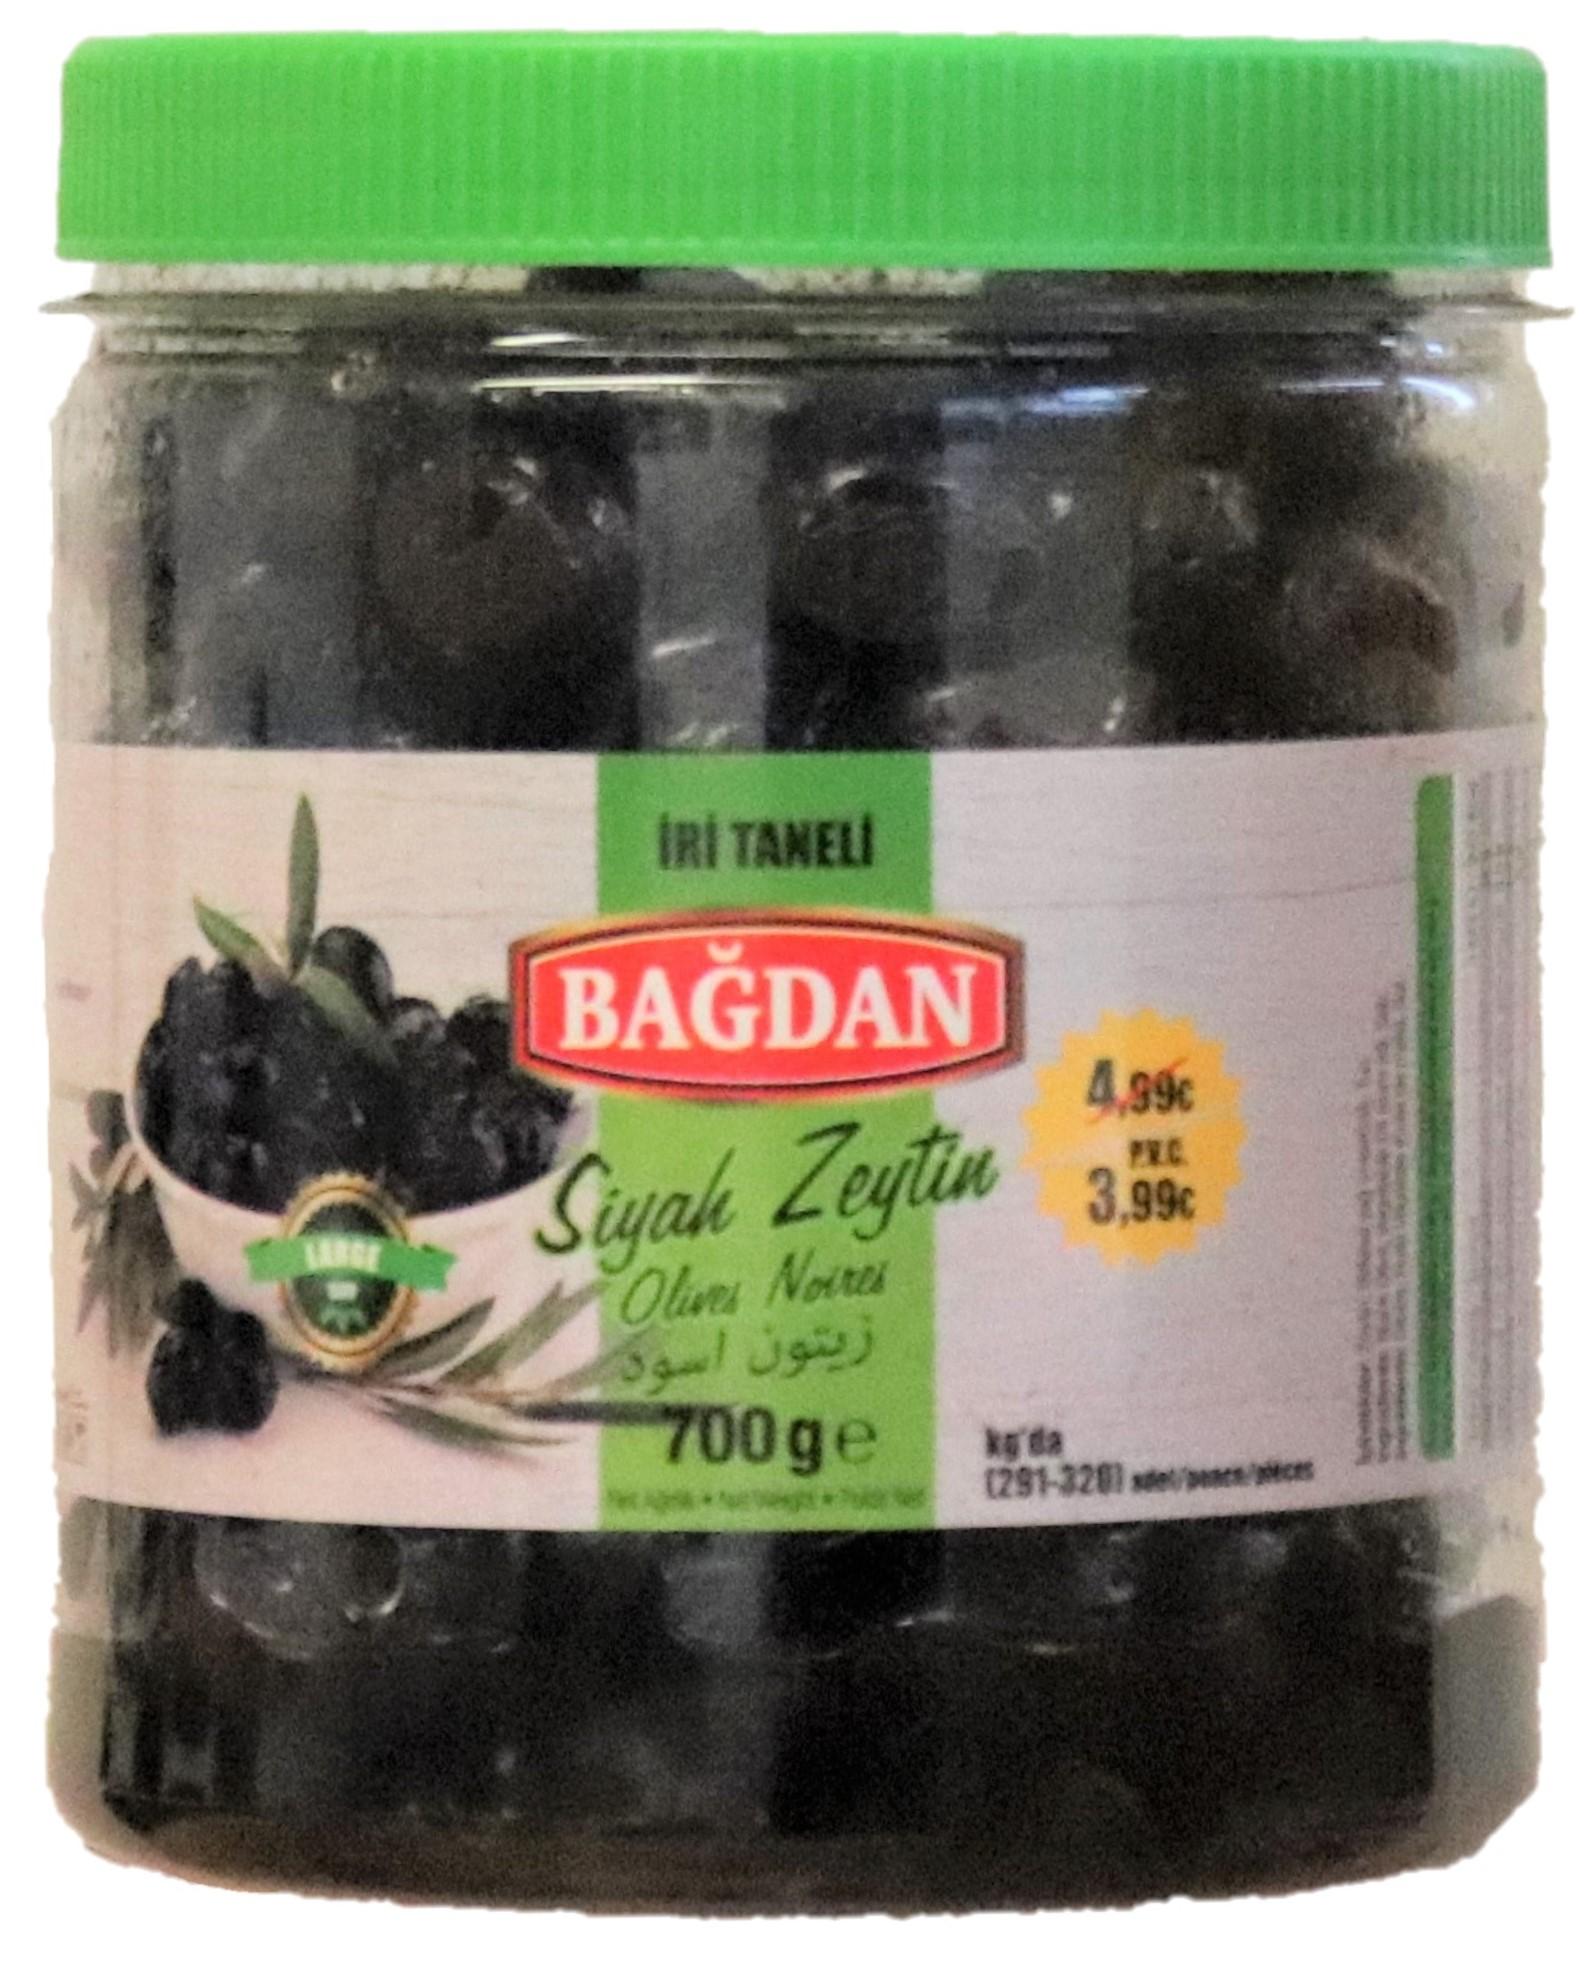 BAGDAN S.ZEYTIN IRI TANELI 6x700GR PROMO 3.99 ( olives noir cal.gros)